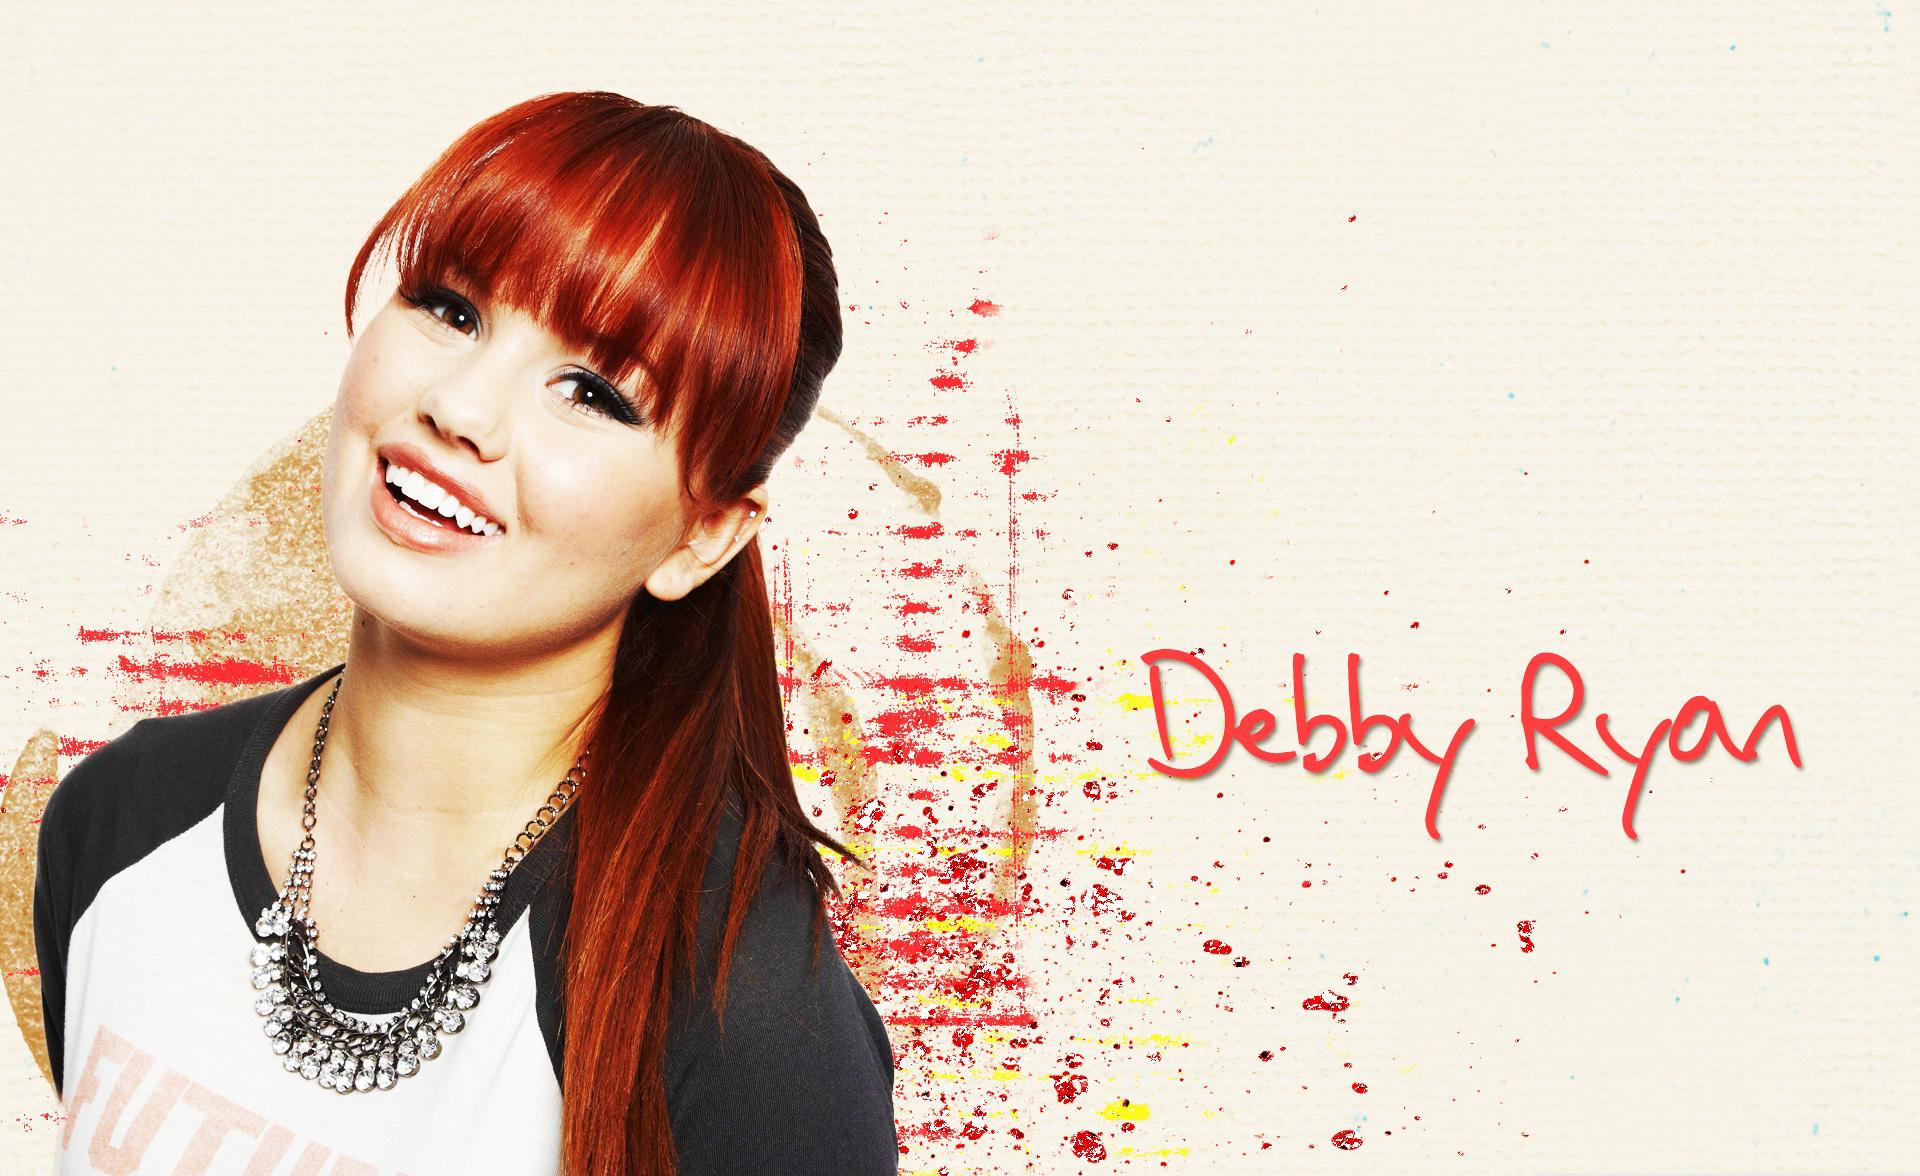 Debby ryan smile photoshoot full hd wallpaper download original voltagebd Gallery